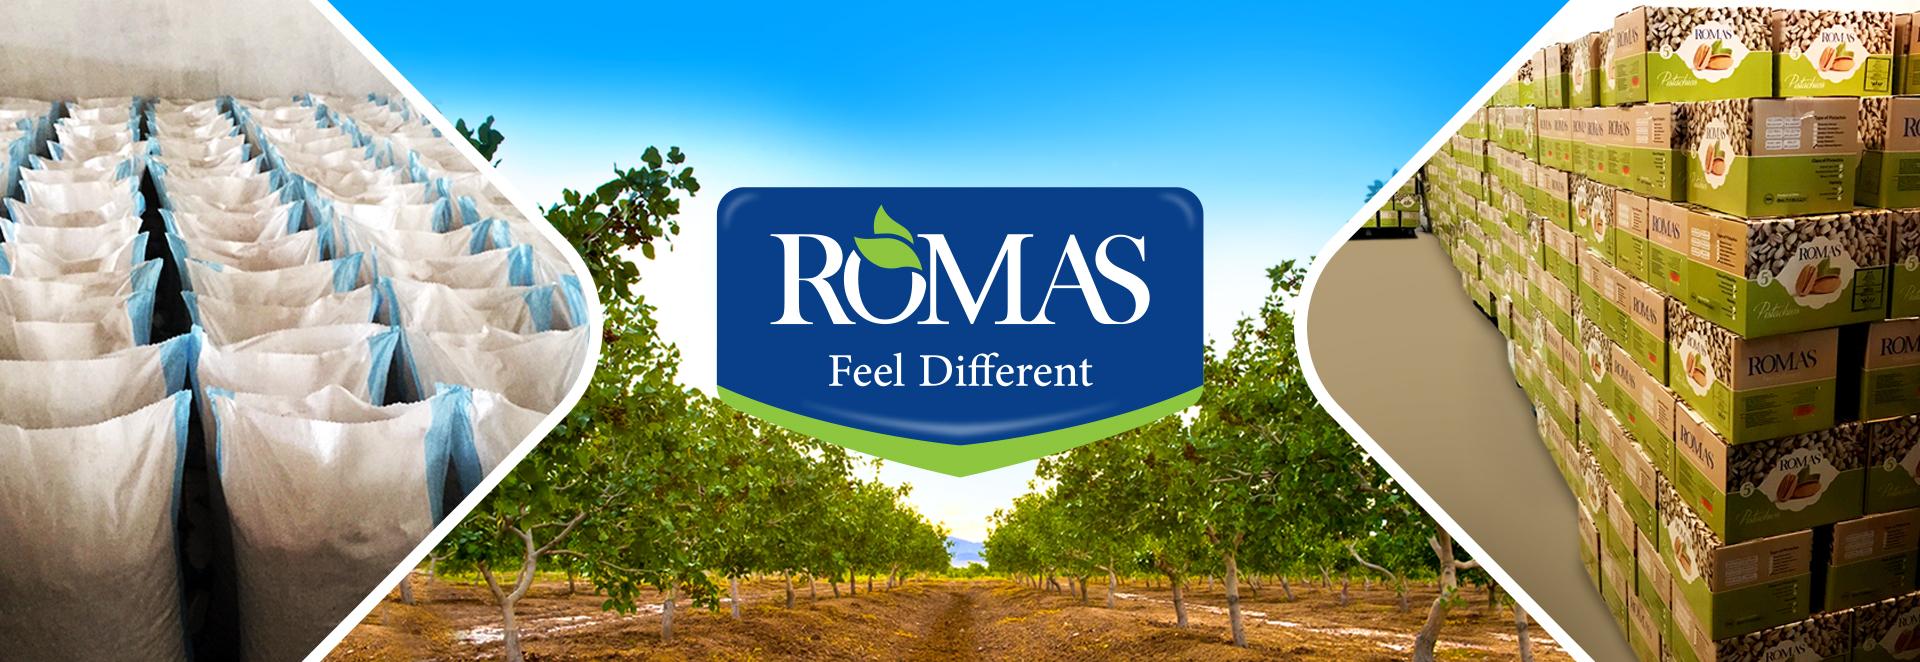 Romas feel different